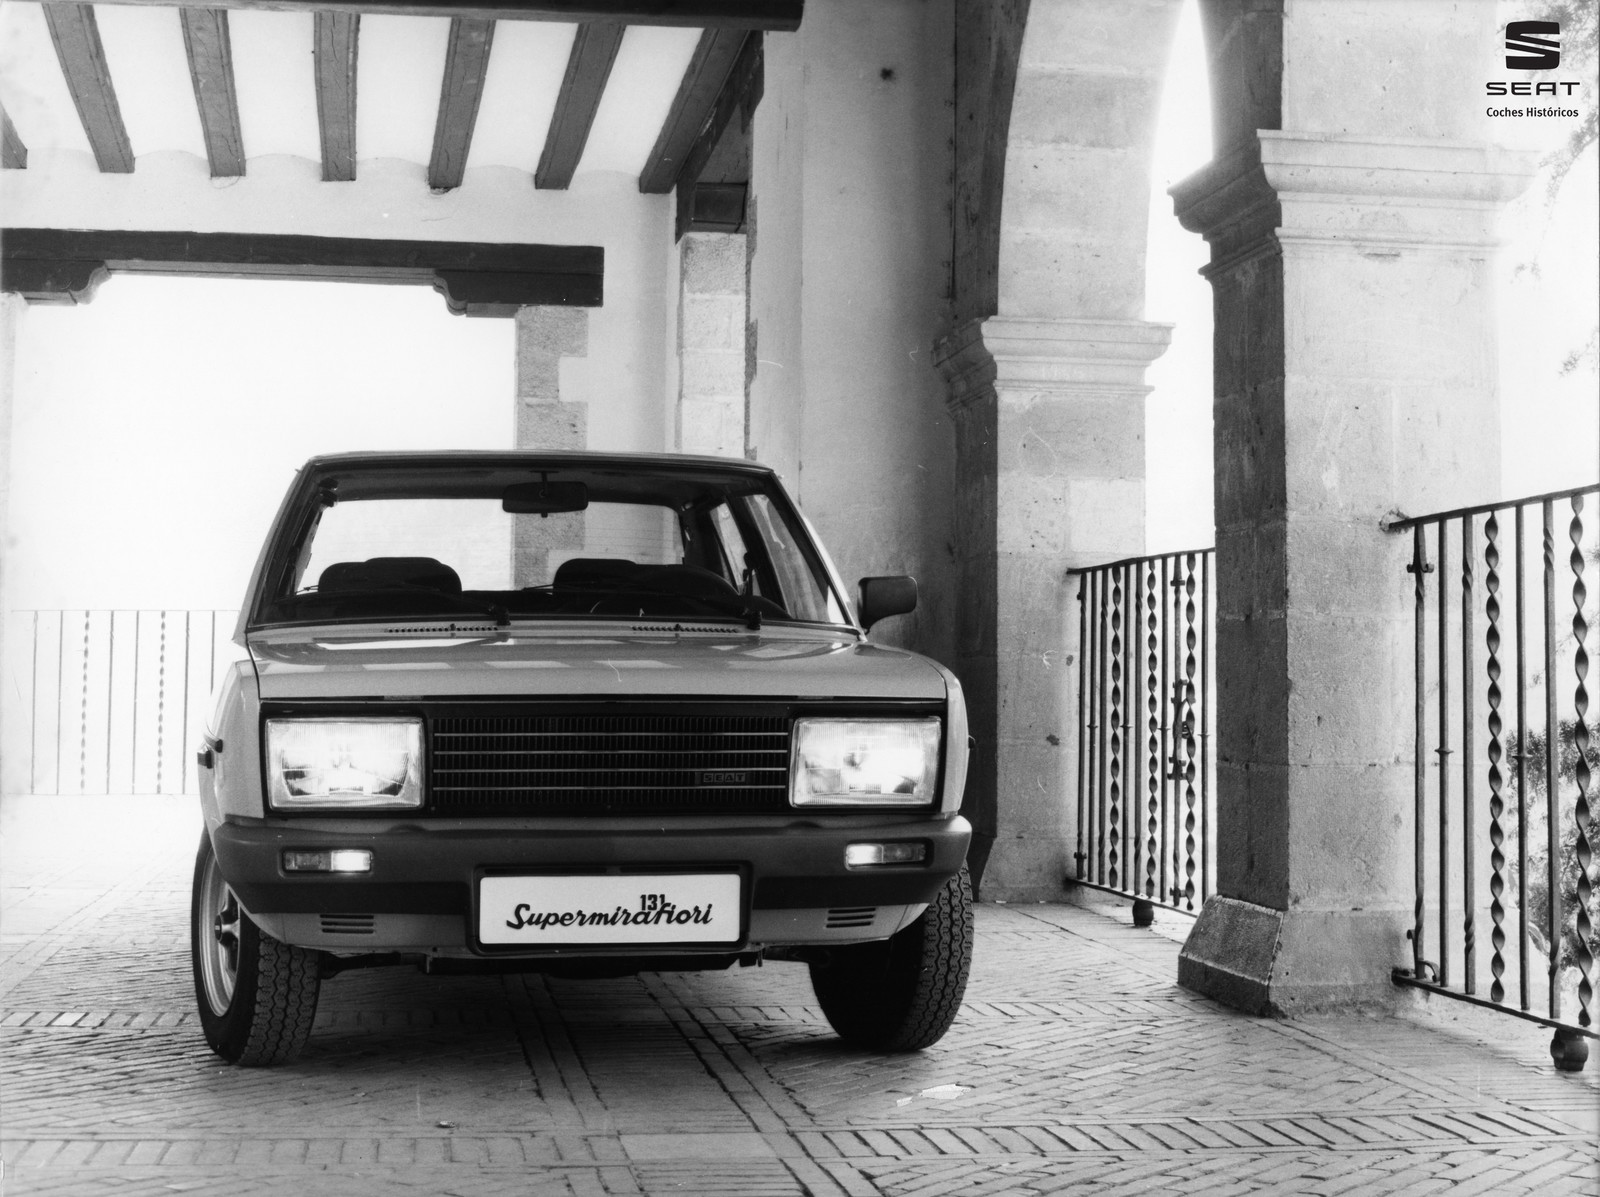 Foto de Motor SEAT 1430 - fotos históricas (20/49)